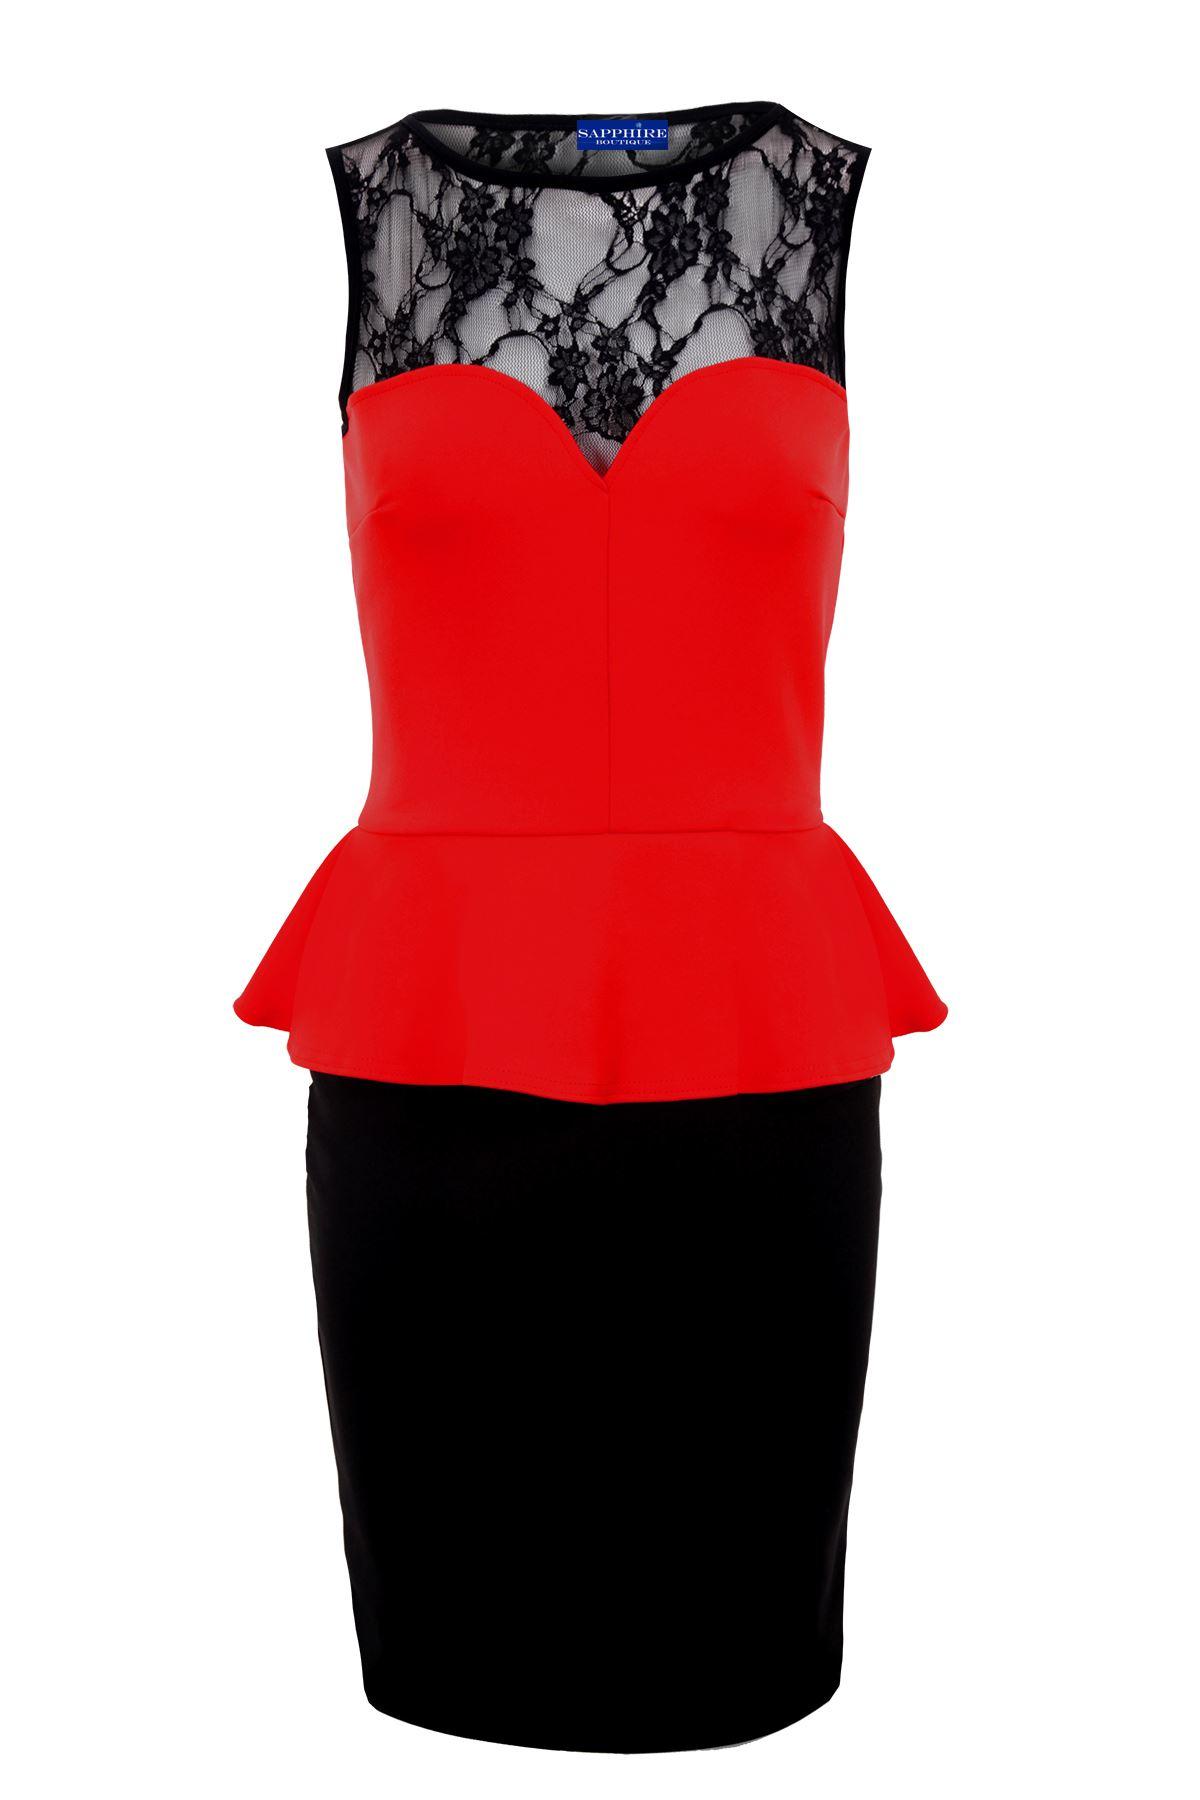 Mujer-Corazon-Encaje-Negro-Mujer-NUEVO-Peplo-Vestido-corto-8-20